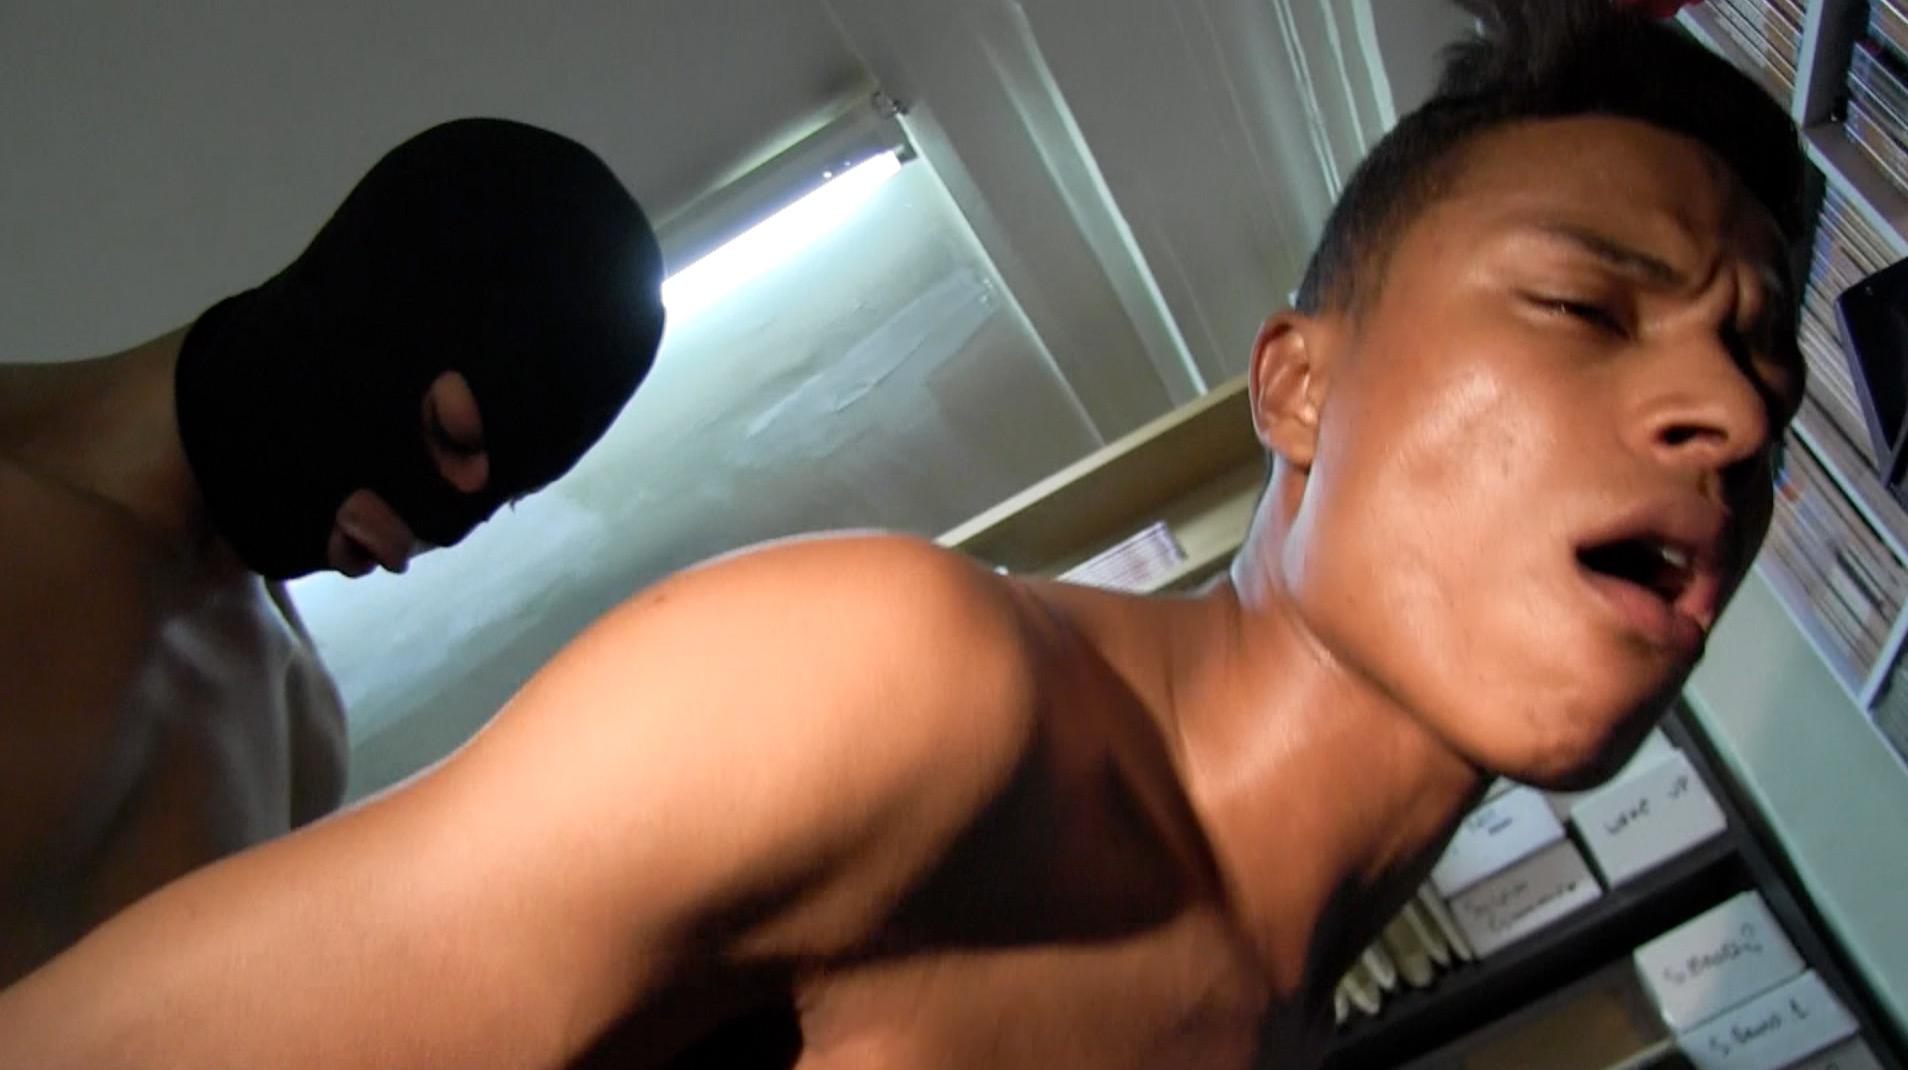 film porno femme escort gay marseille